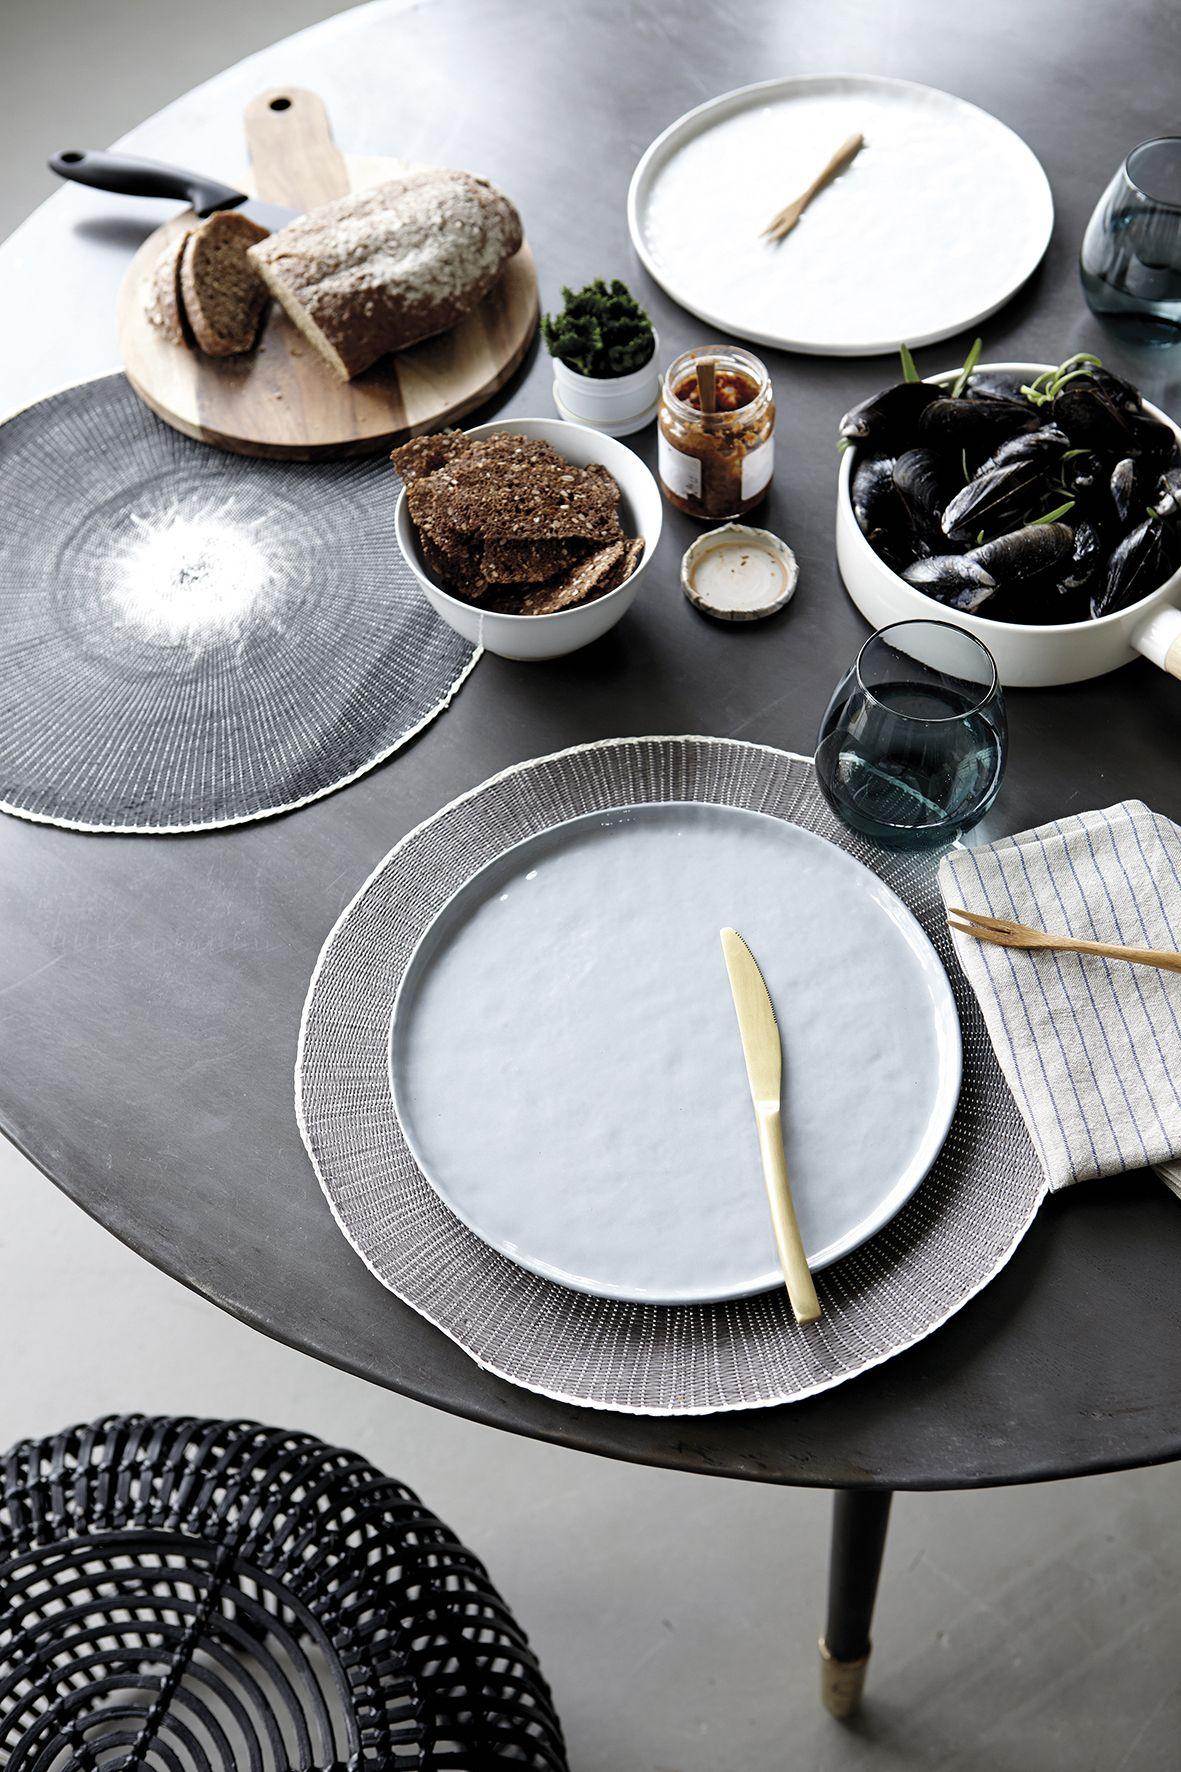 house doctor plates solid ceramics discover pinterest geschirr keramik und gedeckter. Black Bedroom Furniture Sets. Home Design Ideas